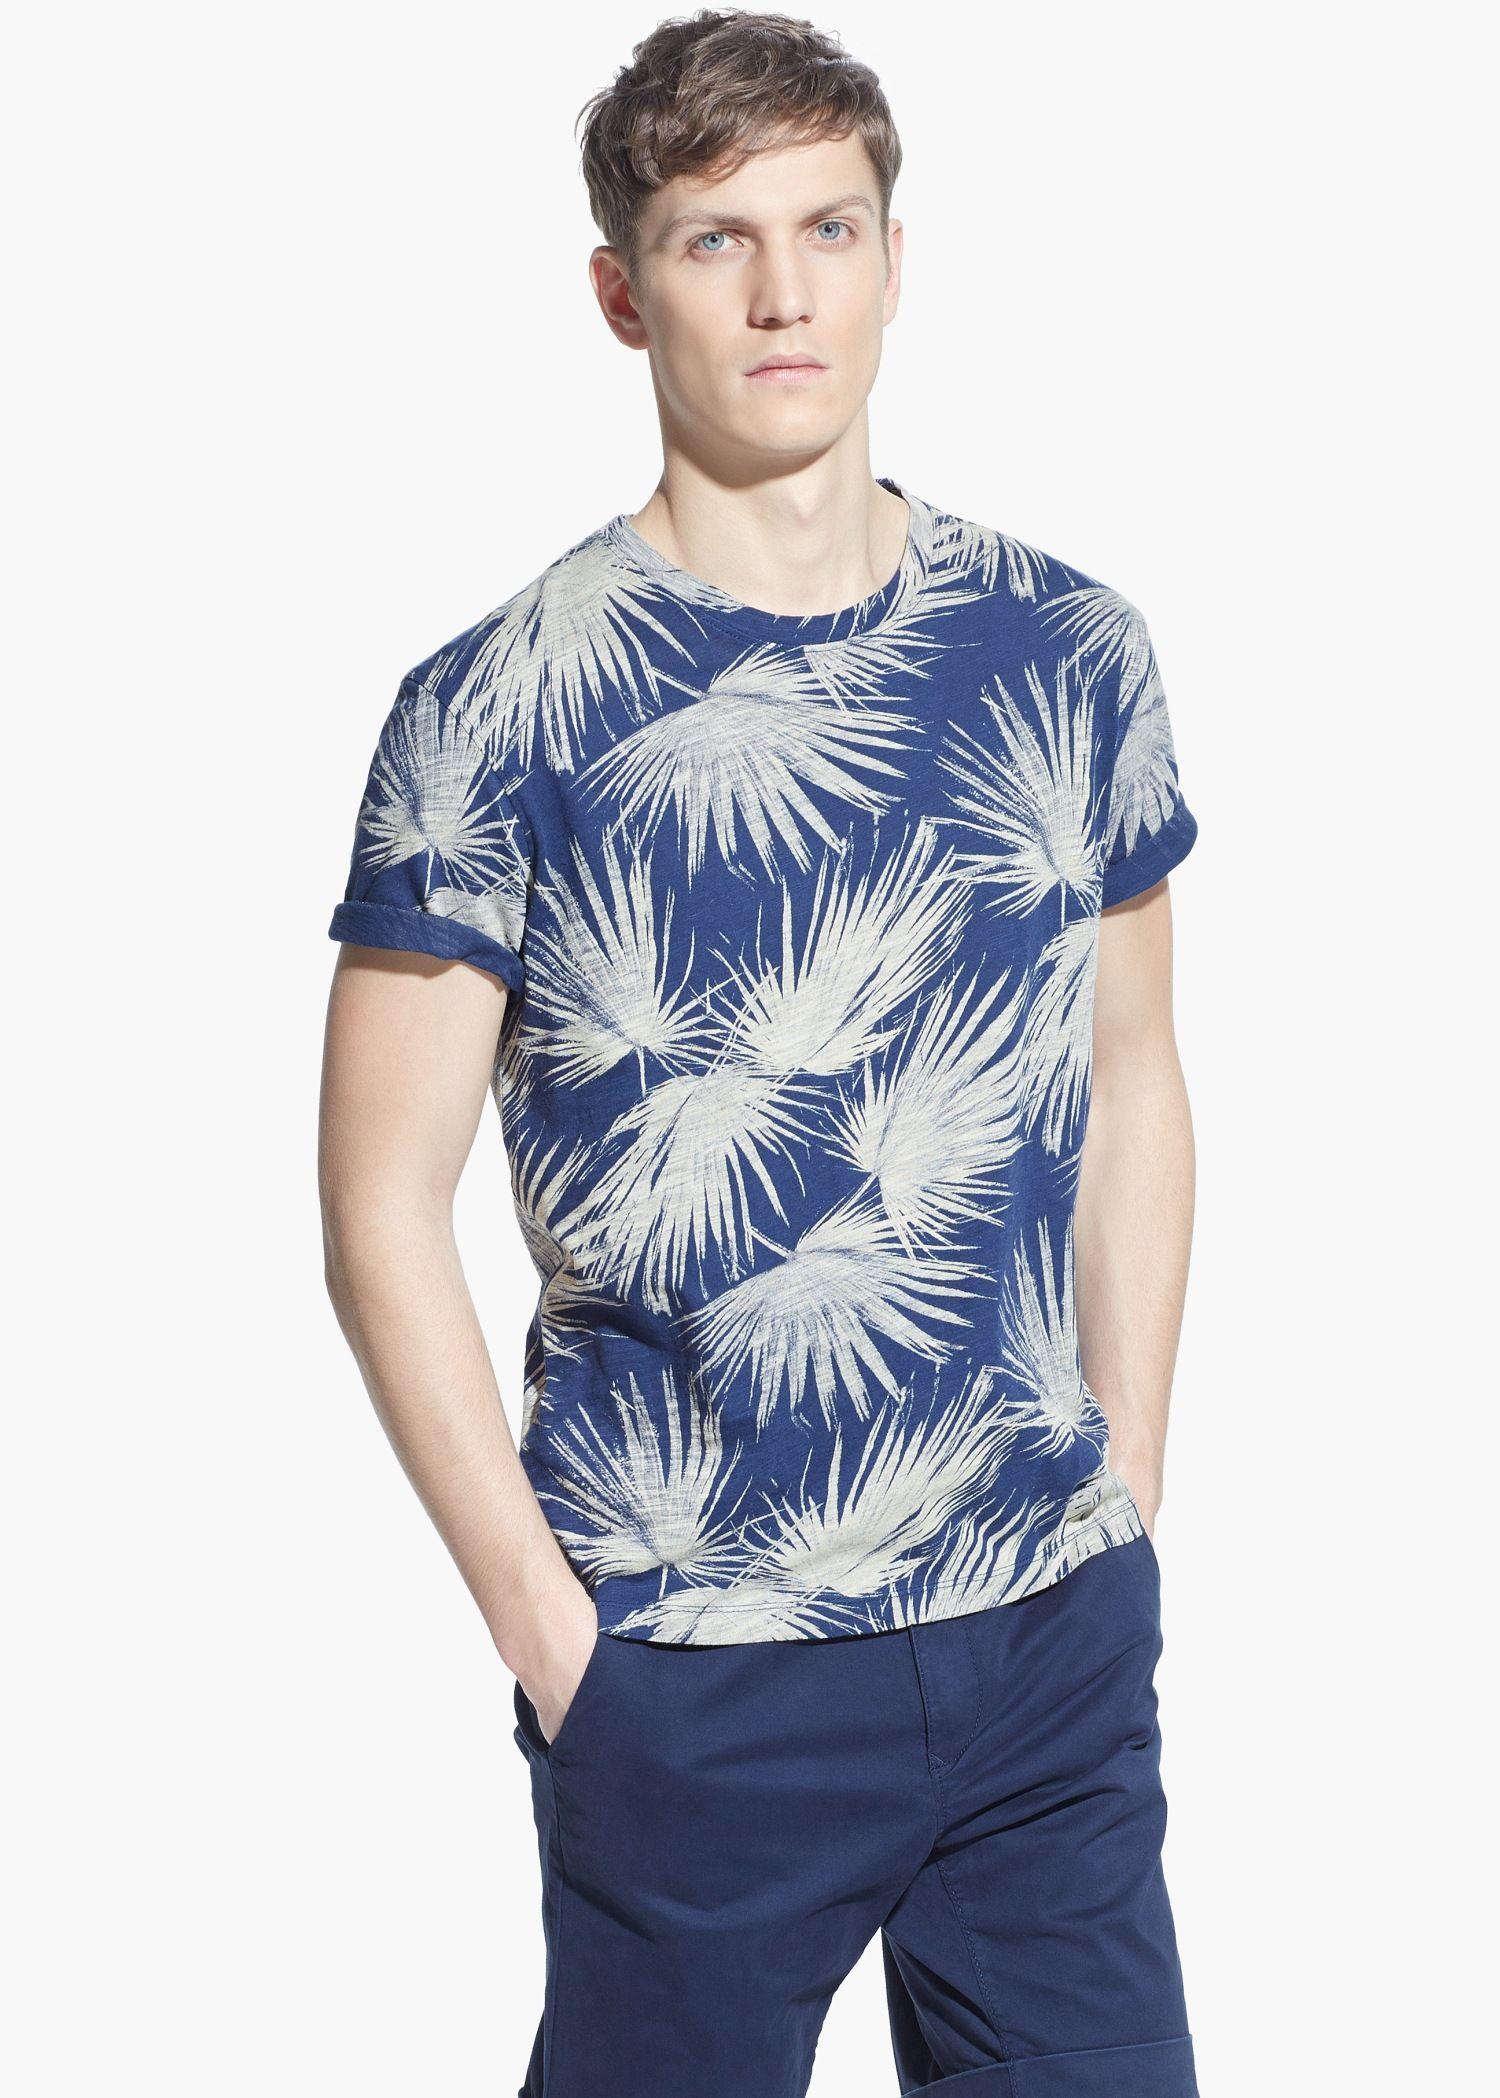 Camiseta estampado hojas - Hombre | MANGO Man España. Mens PjsT Shirt ...